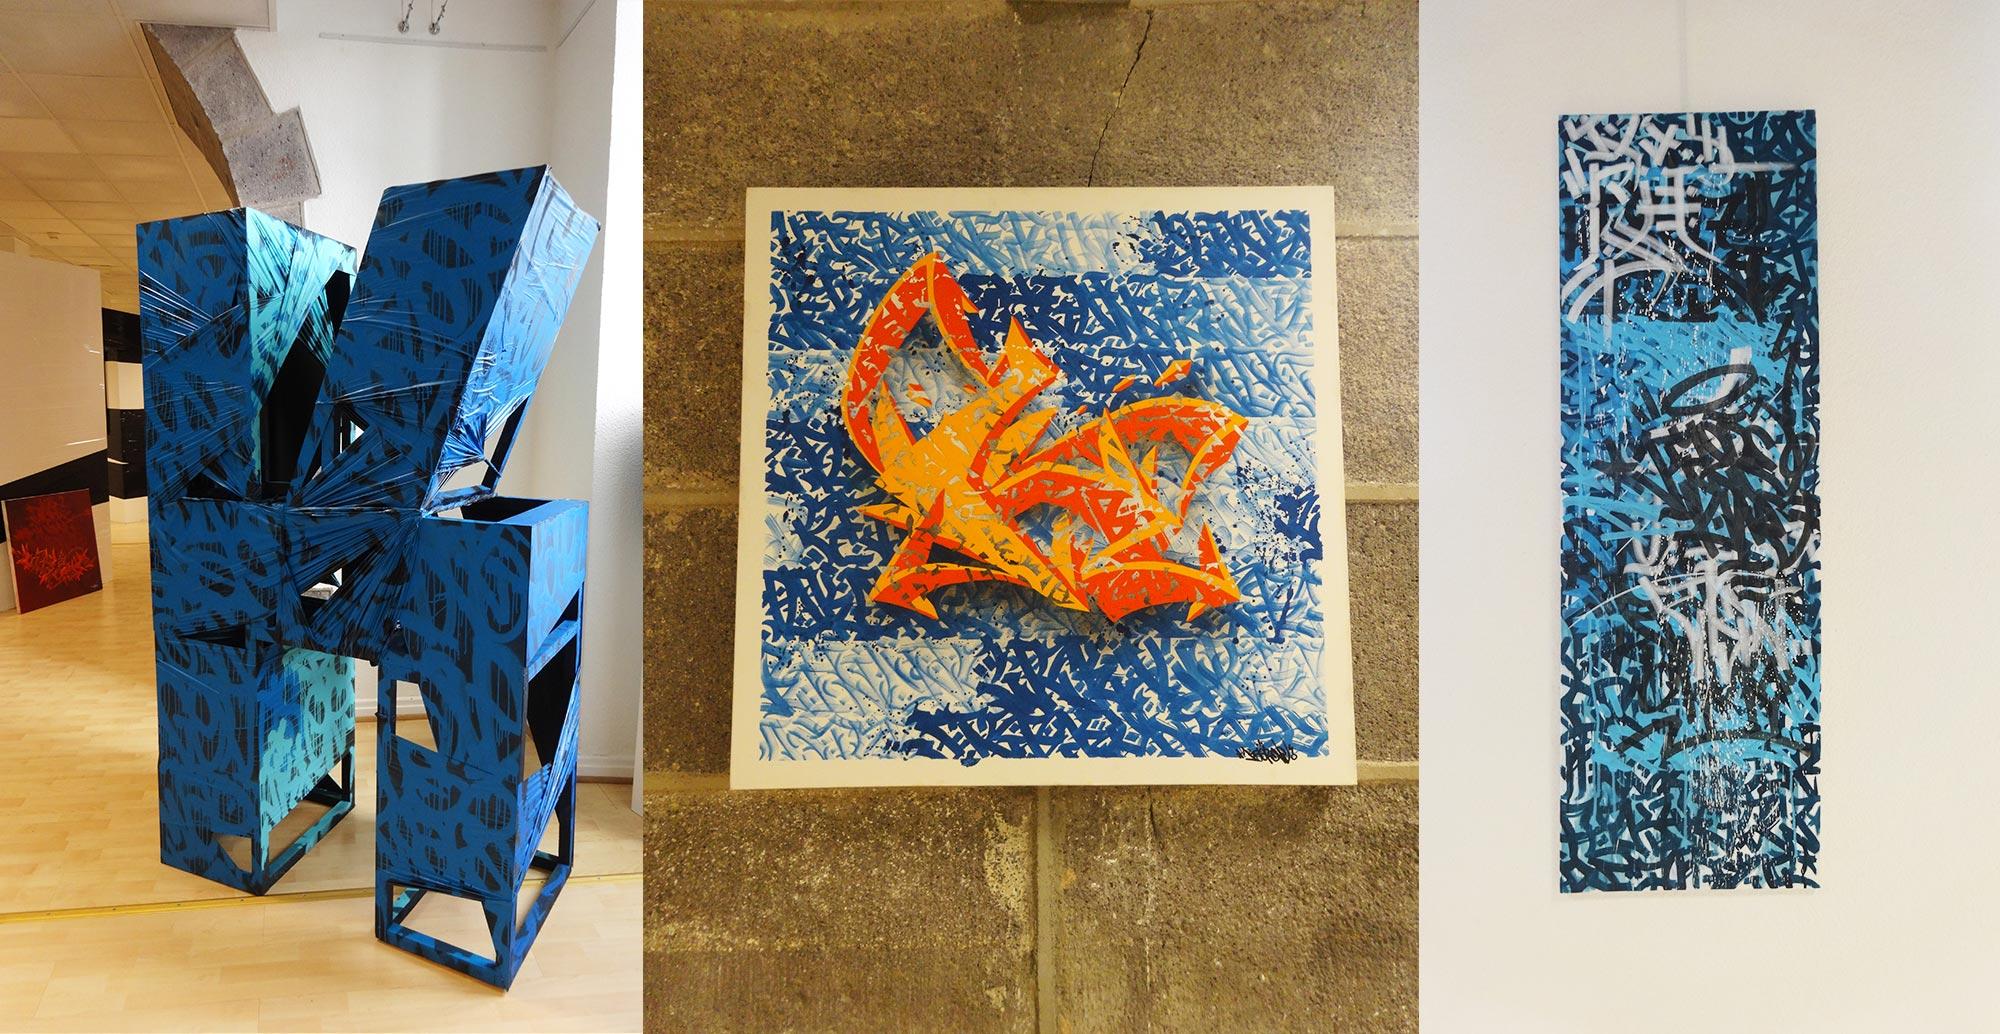 kaer - ENDtoEND - Exposition Camille Claudel  - Clermont Ferrand